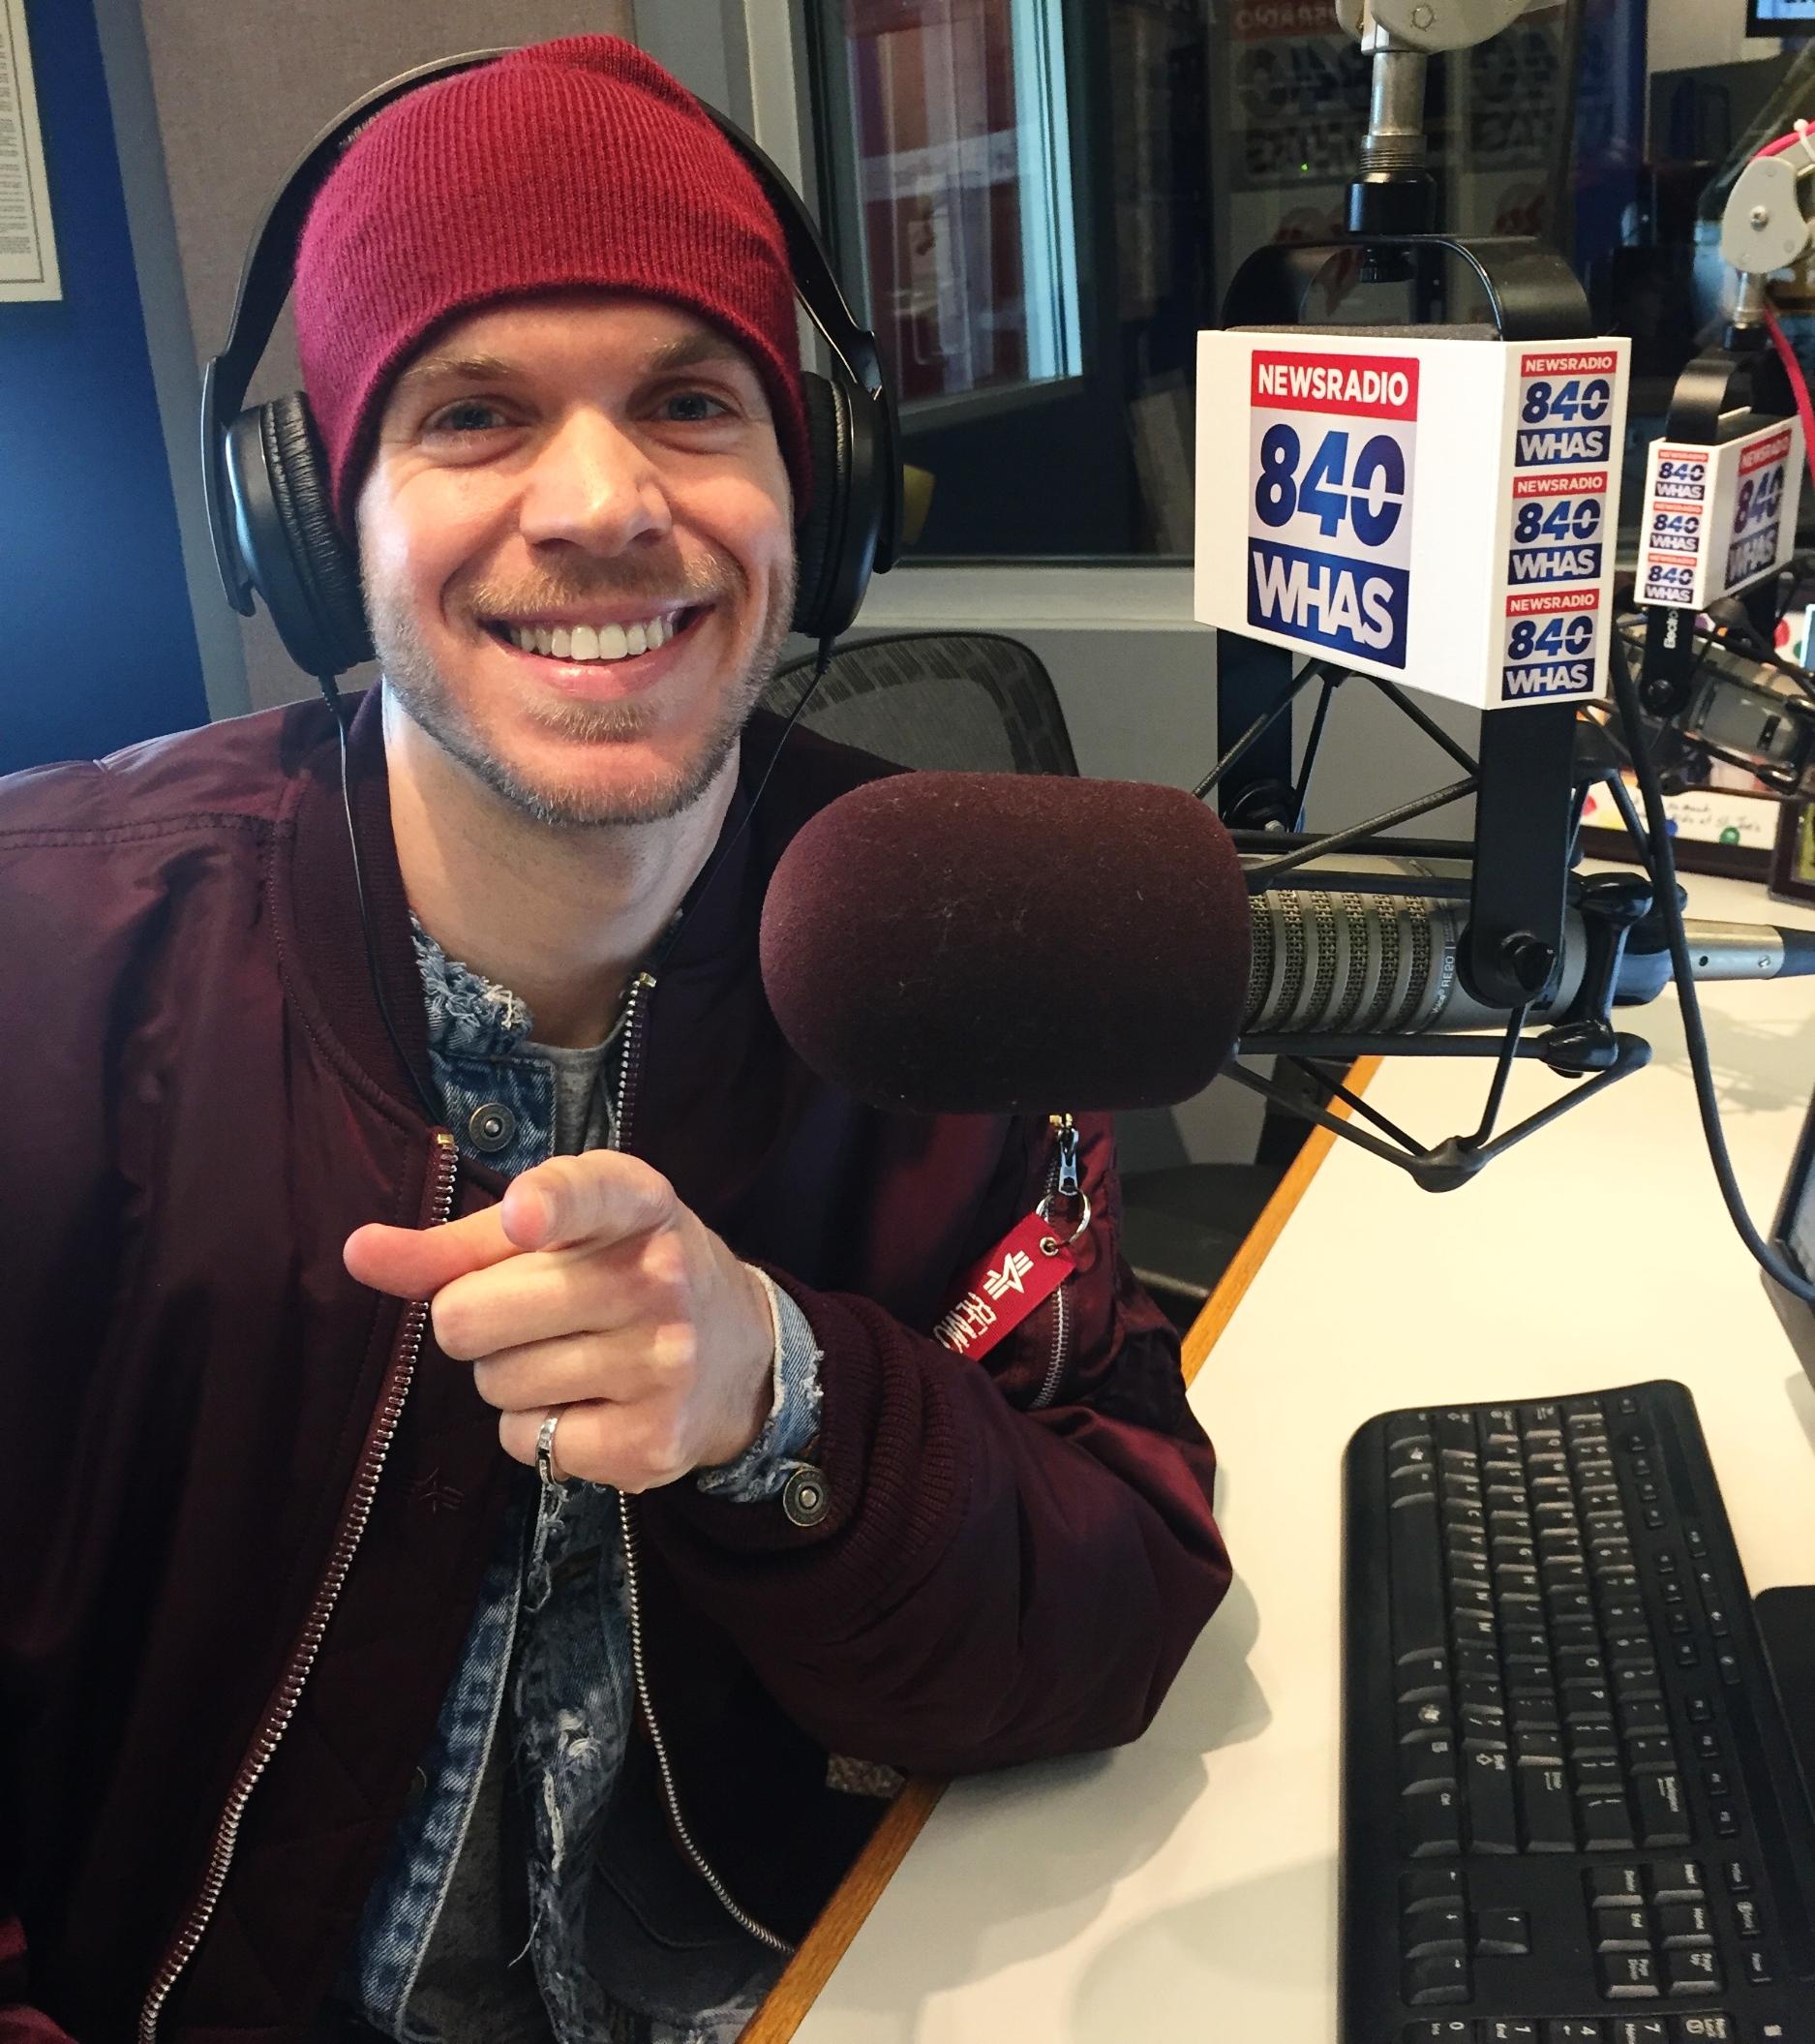 840WHAS  NewsRadio Interview